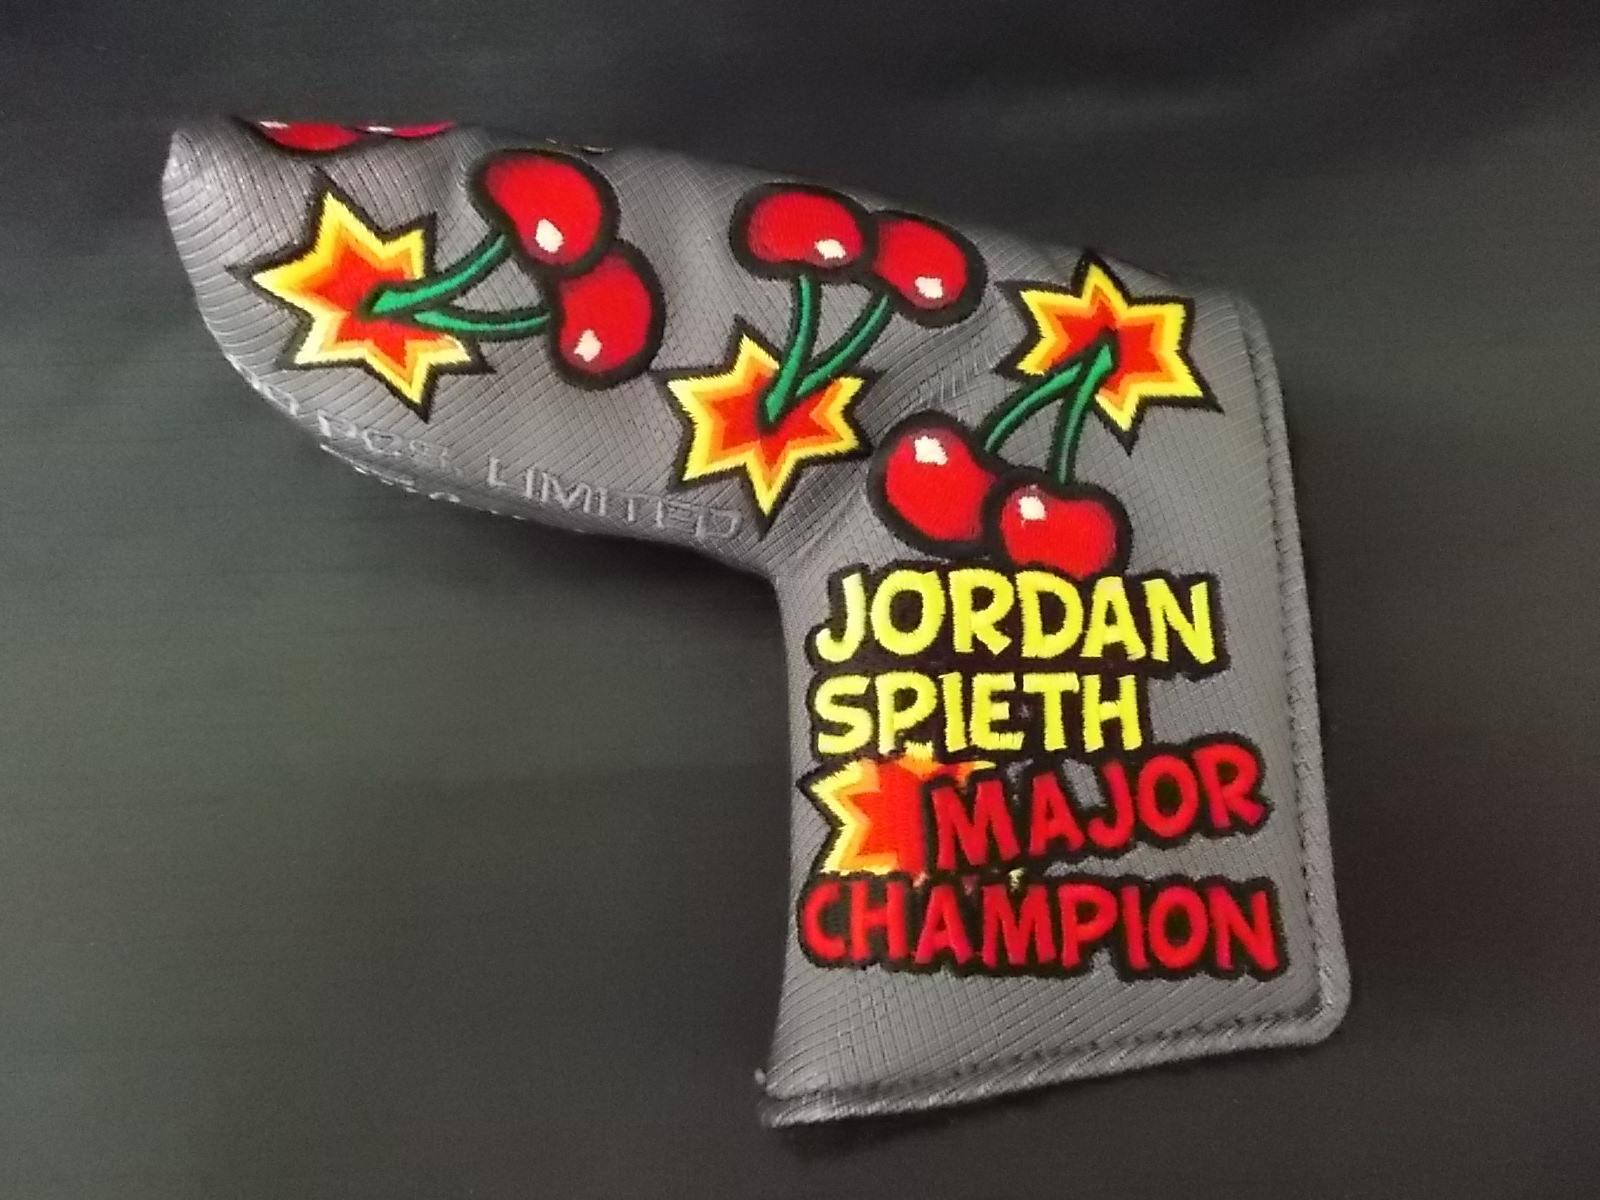 Inspired by Jordan Spieth Limited Putter SCOTTY CAMERON 世界限定 1500本限定 ジョーダンスピース クロマティックブロンズ仕上げ